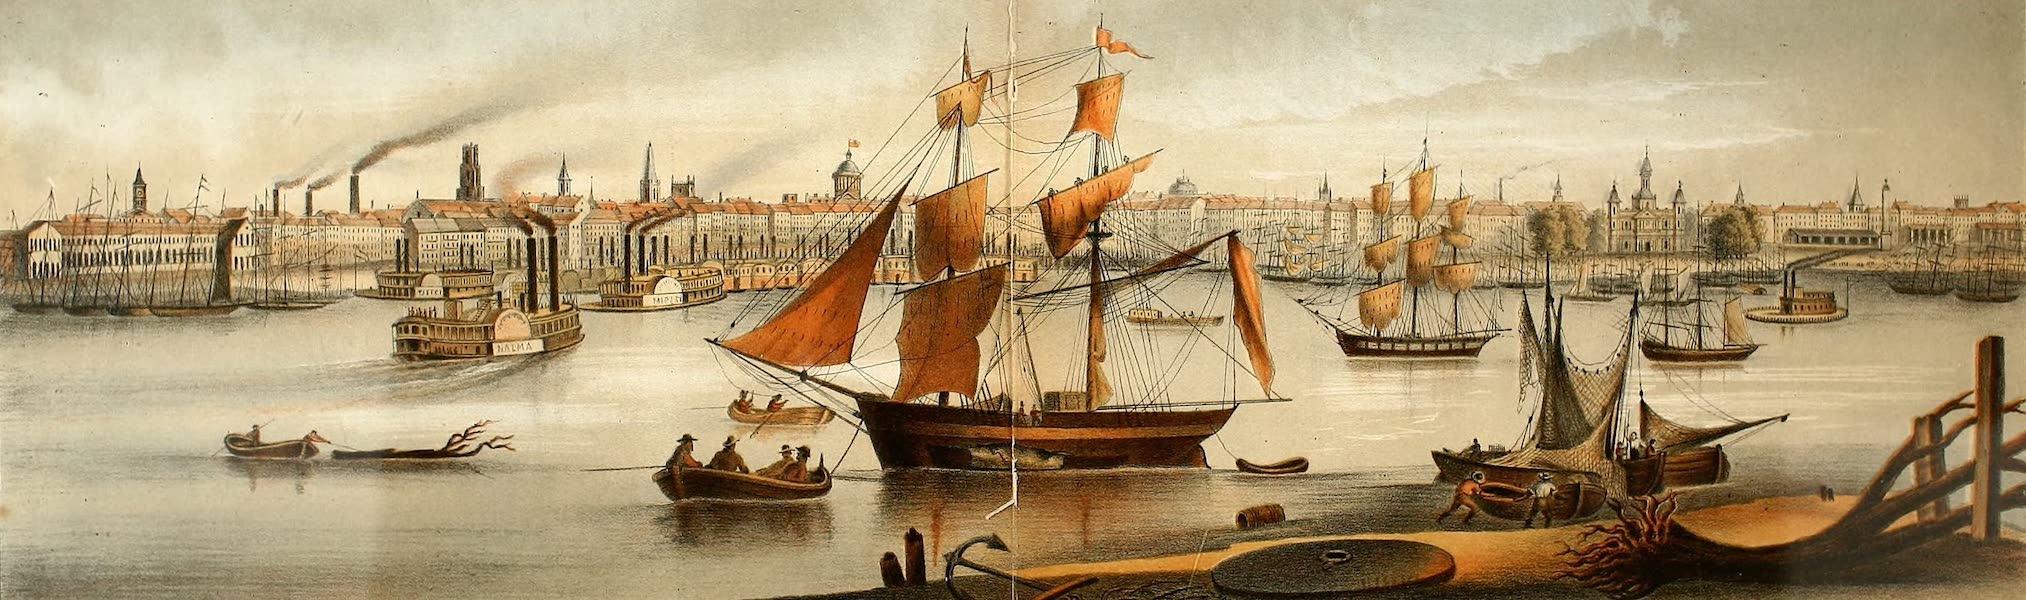 Das Illustrirte Mississippithal - New Orleans, Louisiana (1857)